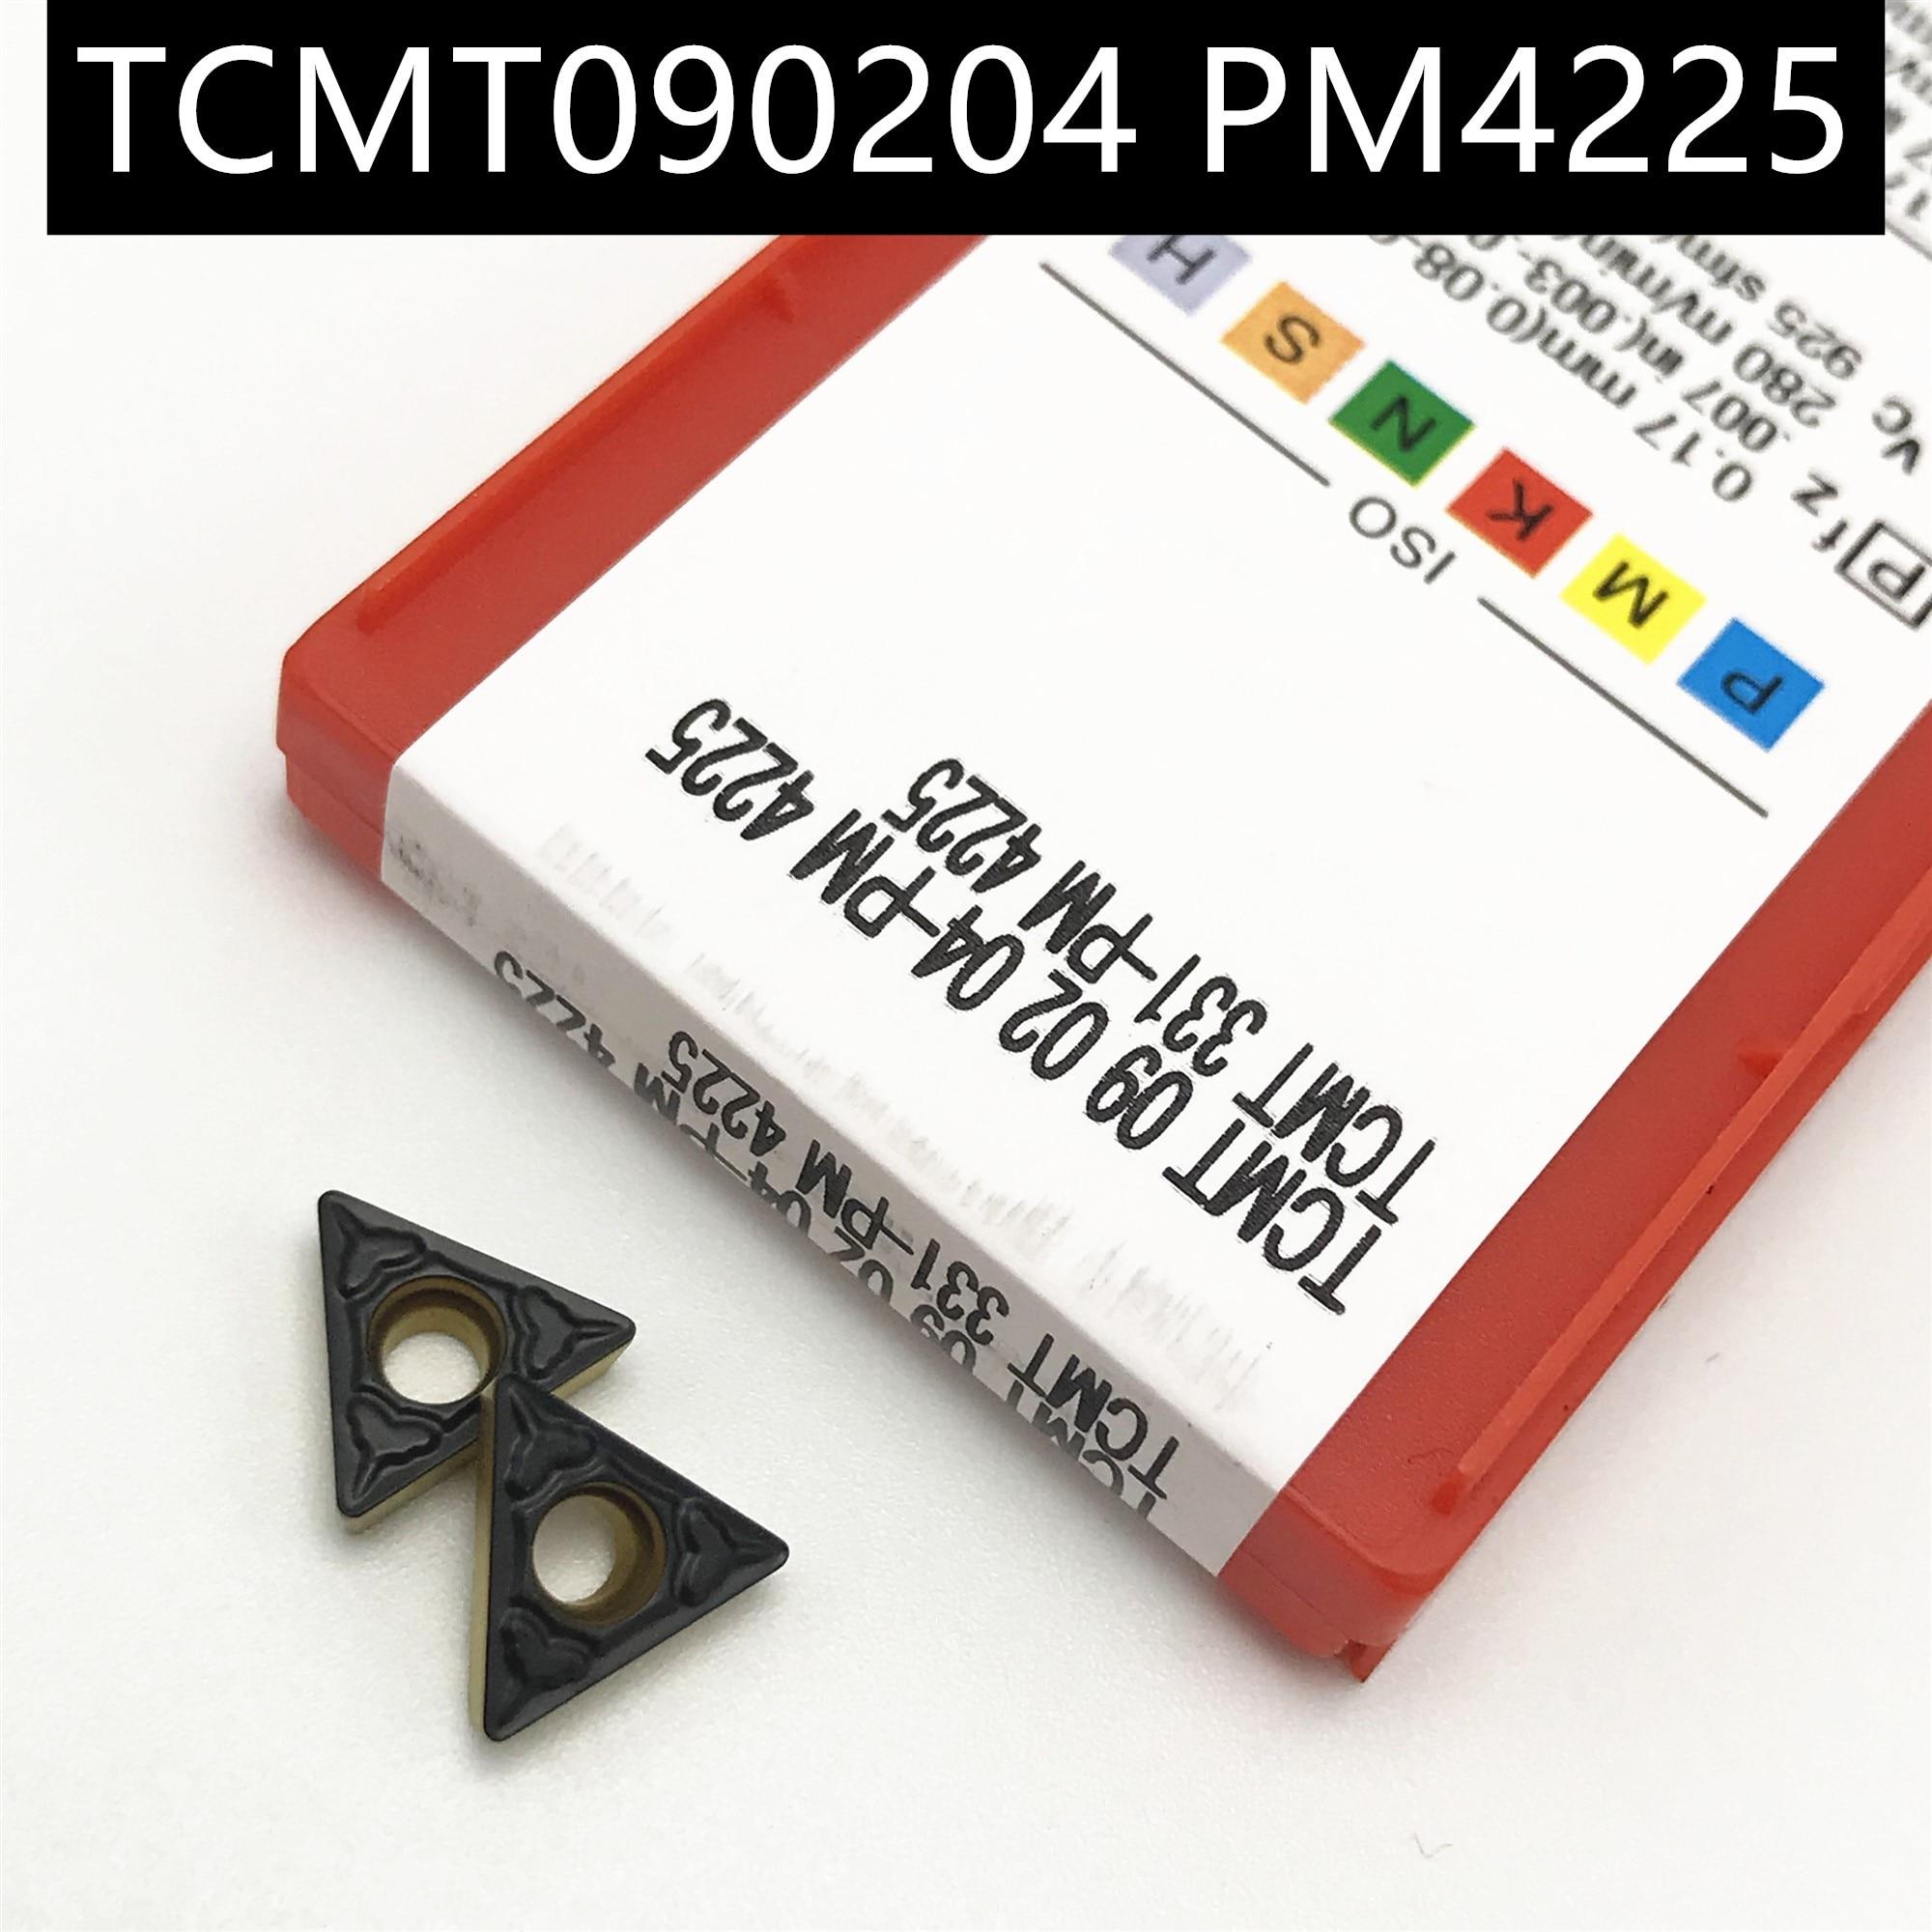 10PCS TCMT090204 PM 4225 Carbide Insert Turning Tool Turning Milling Cutter CNC Cutting Tool Slot Cutting PM 4225